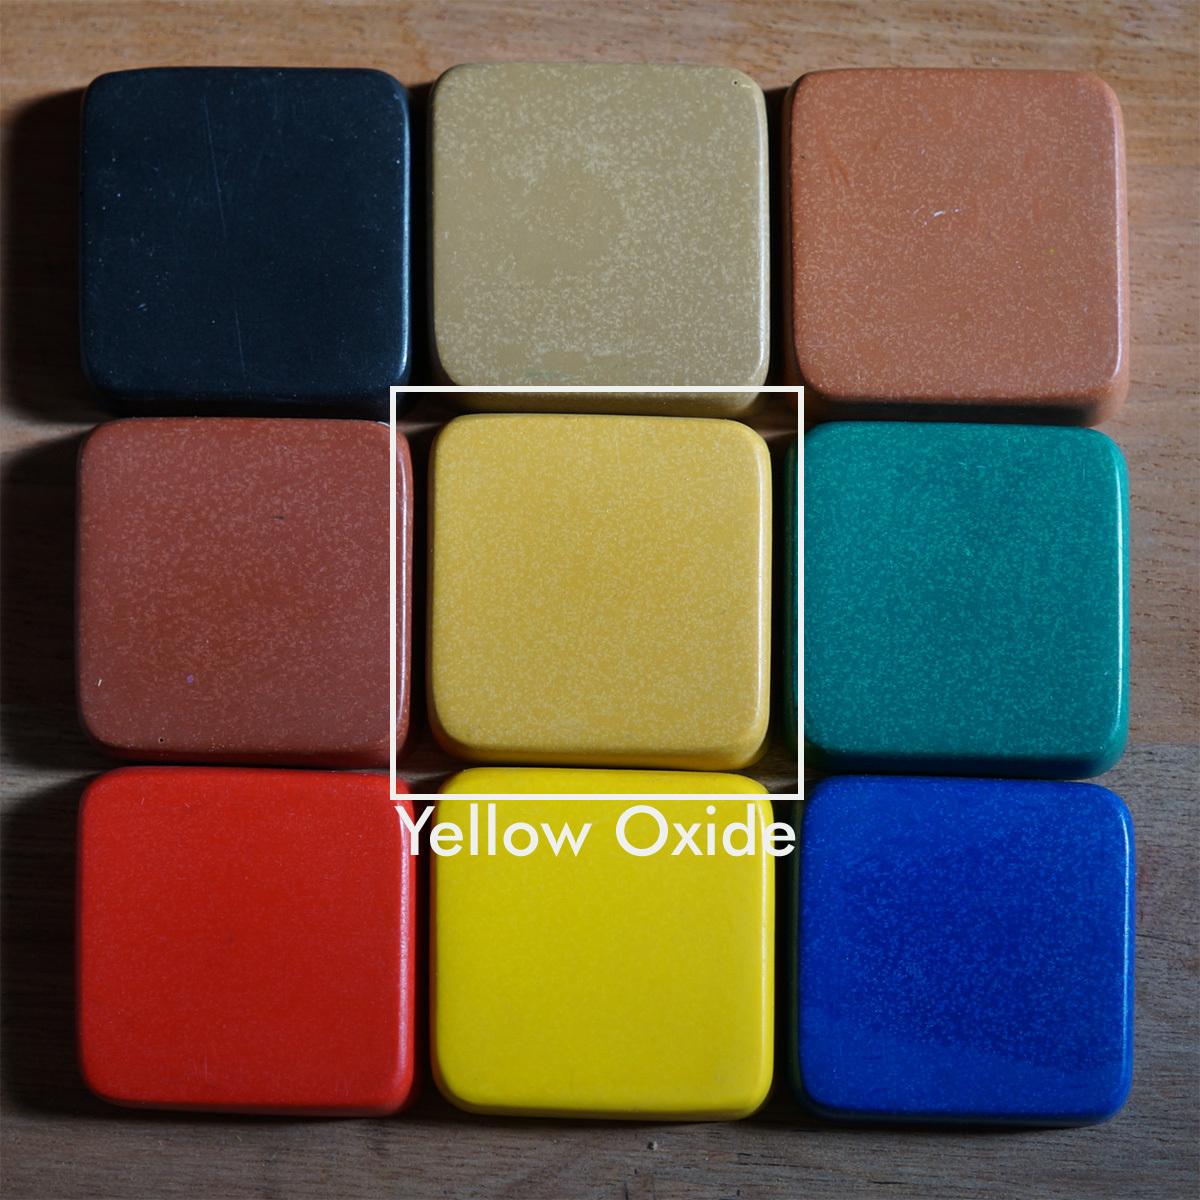 PIGMENT YELLOW OXIDE 200g(着色剤:イエローオキソイド 200g) - 画像2